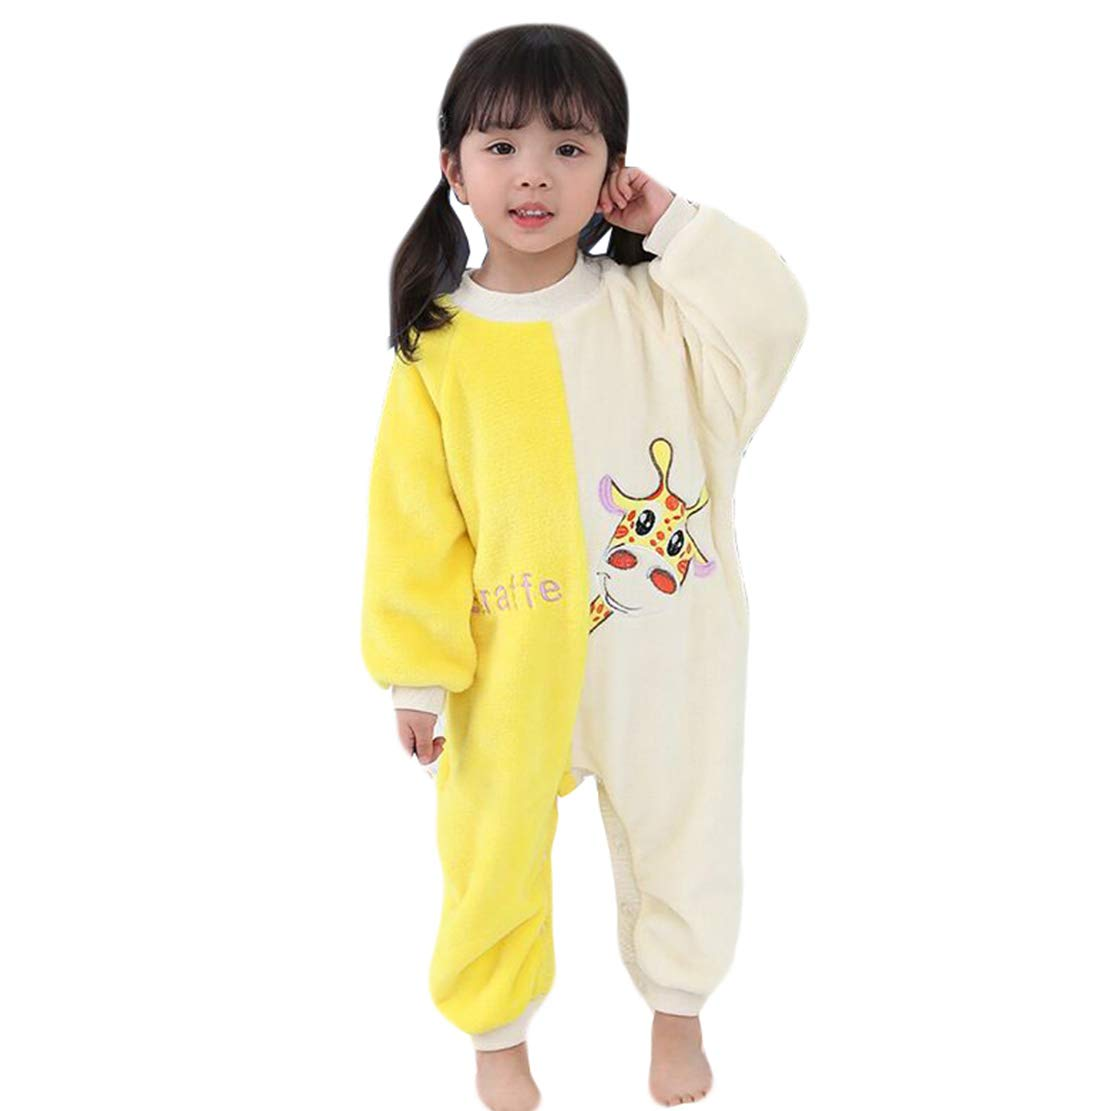 Pijama Entero de Mono Manga Larga Ropa de Dormir Franela Invierno Grueso y C/álido Impresi/ón Saco de Dormir Ni/ño Ni/ña 1-6 a/ños